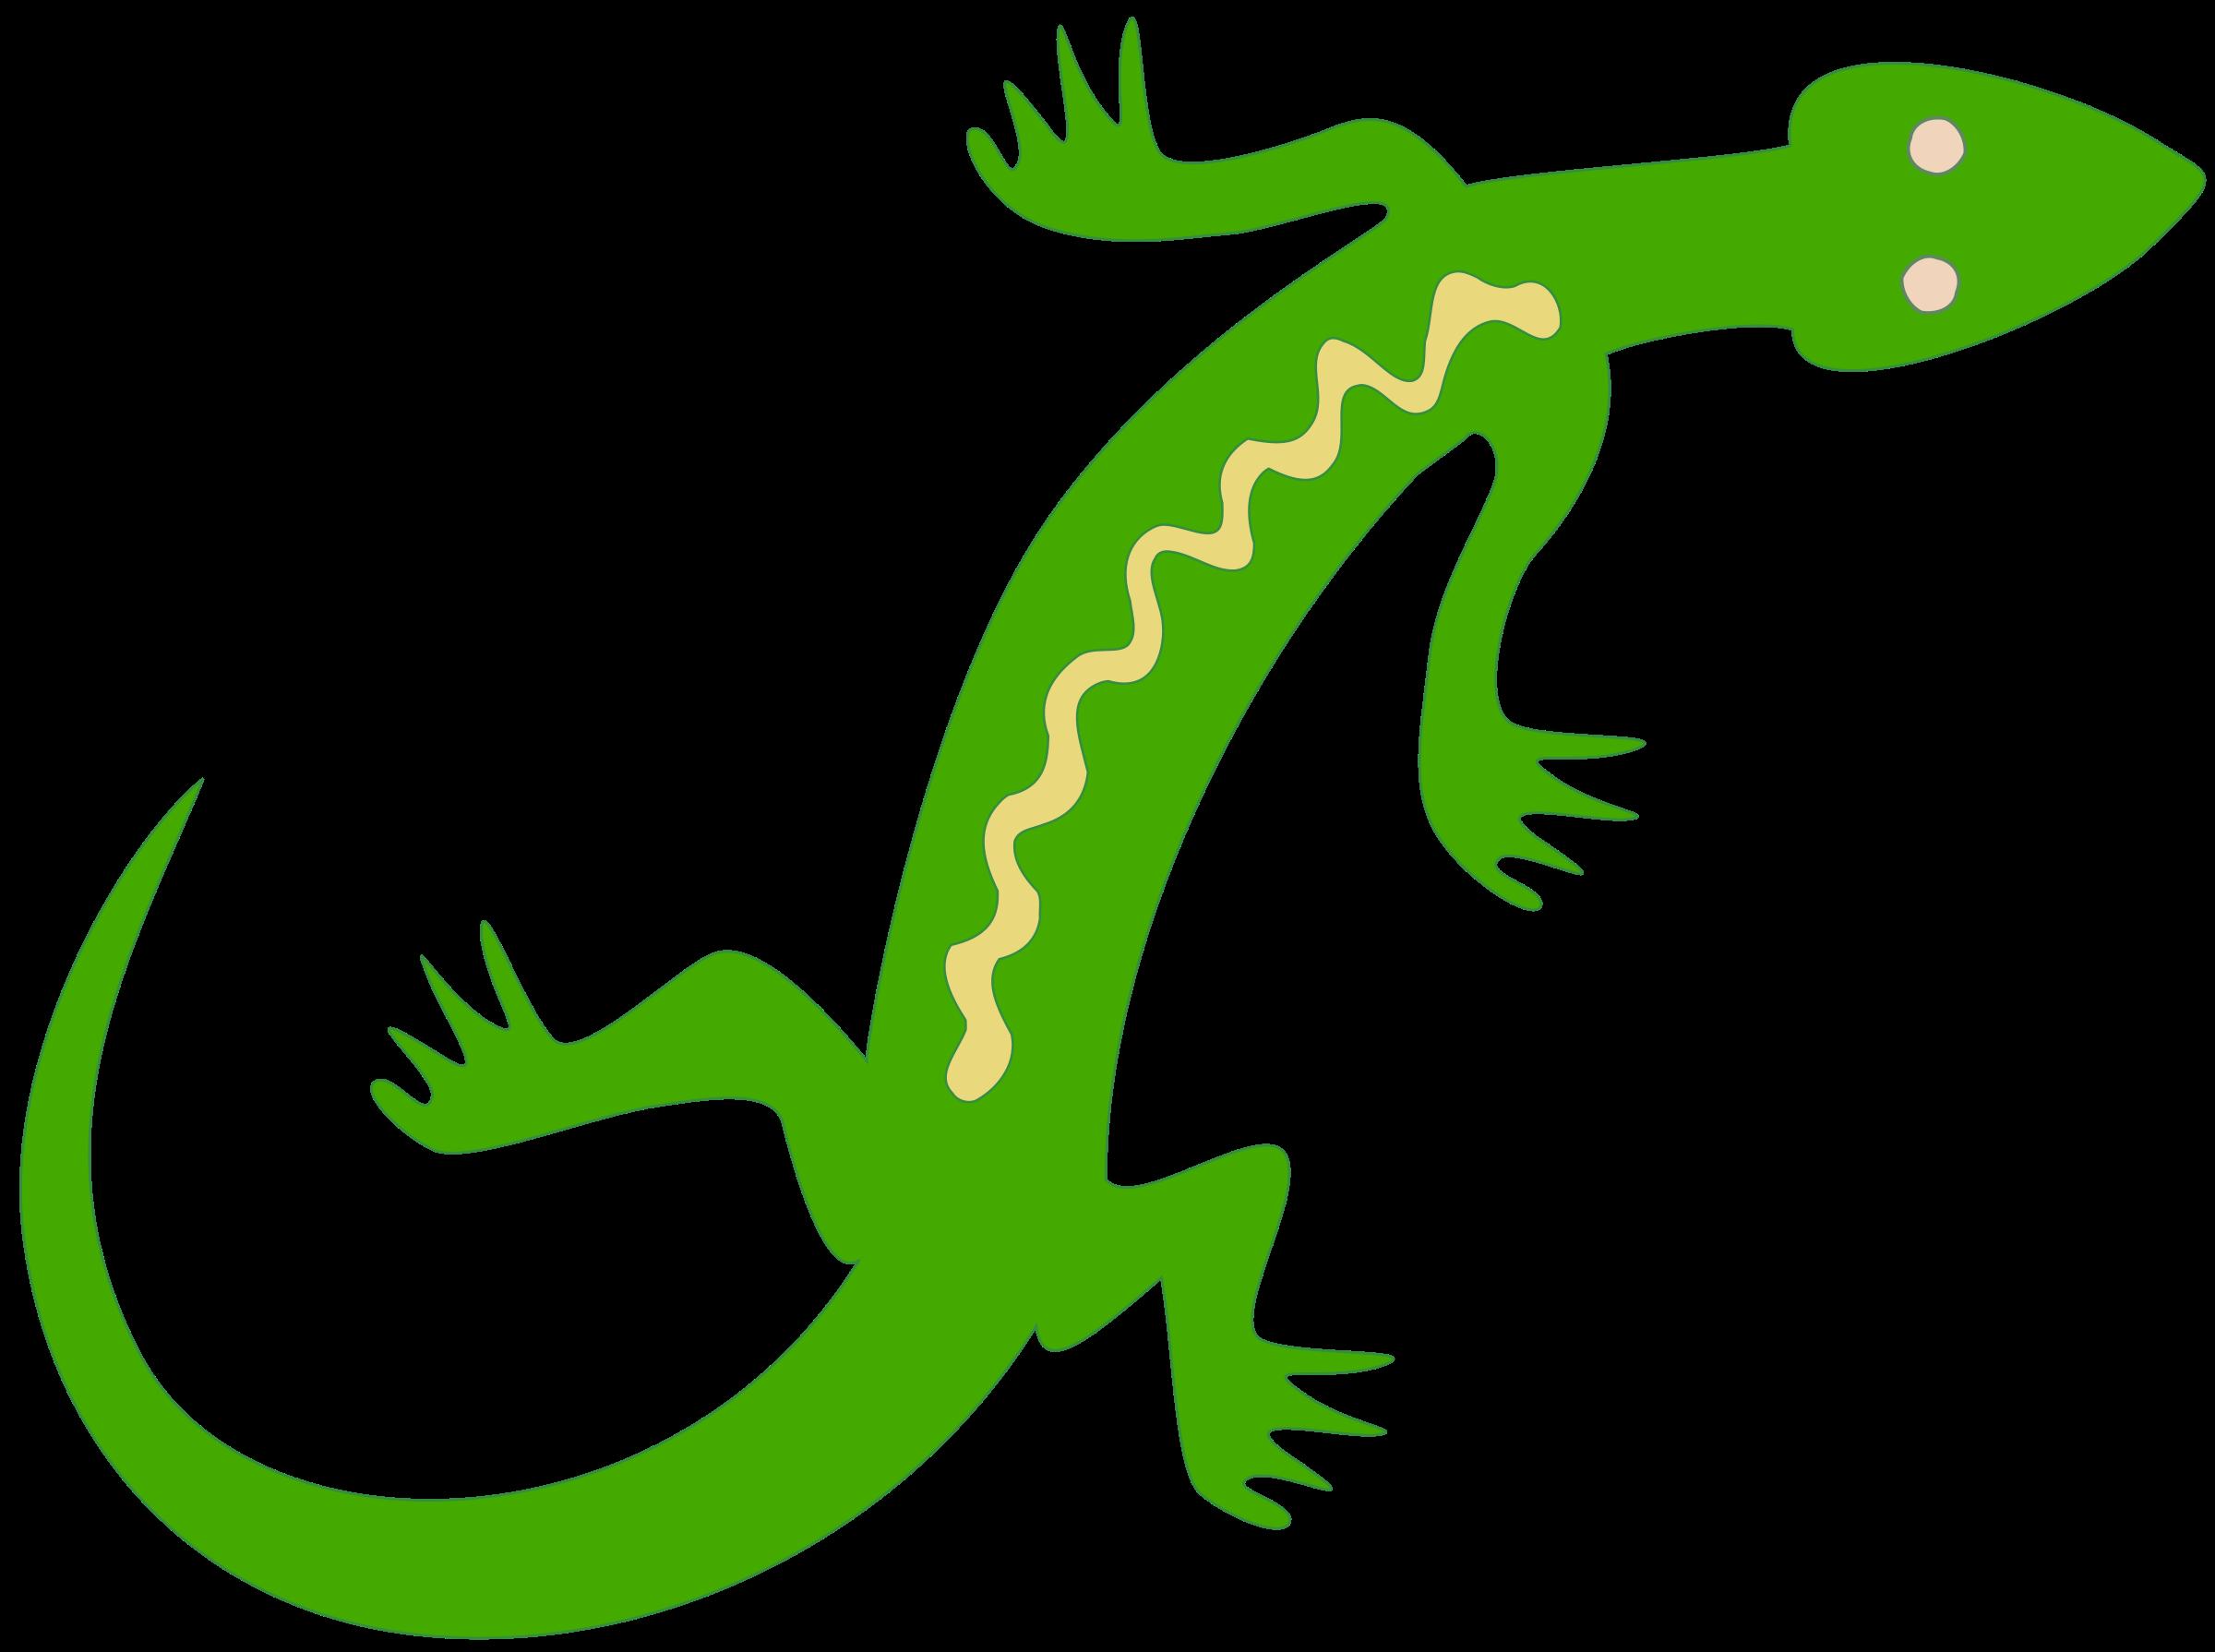 Noble colour big image. Gecko clipart small lizard